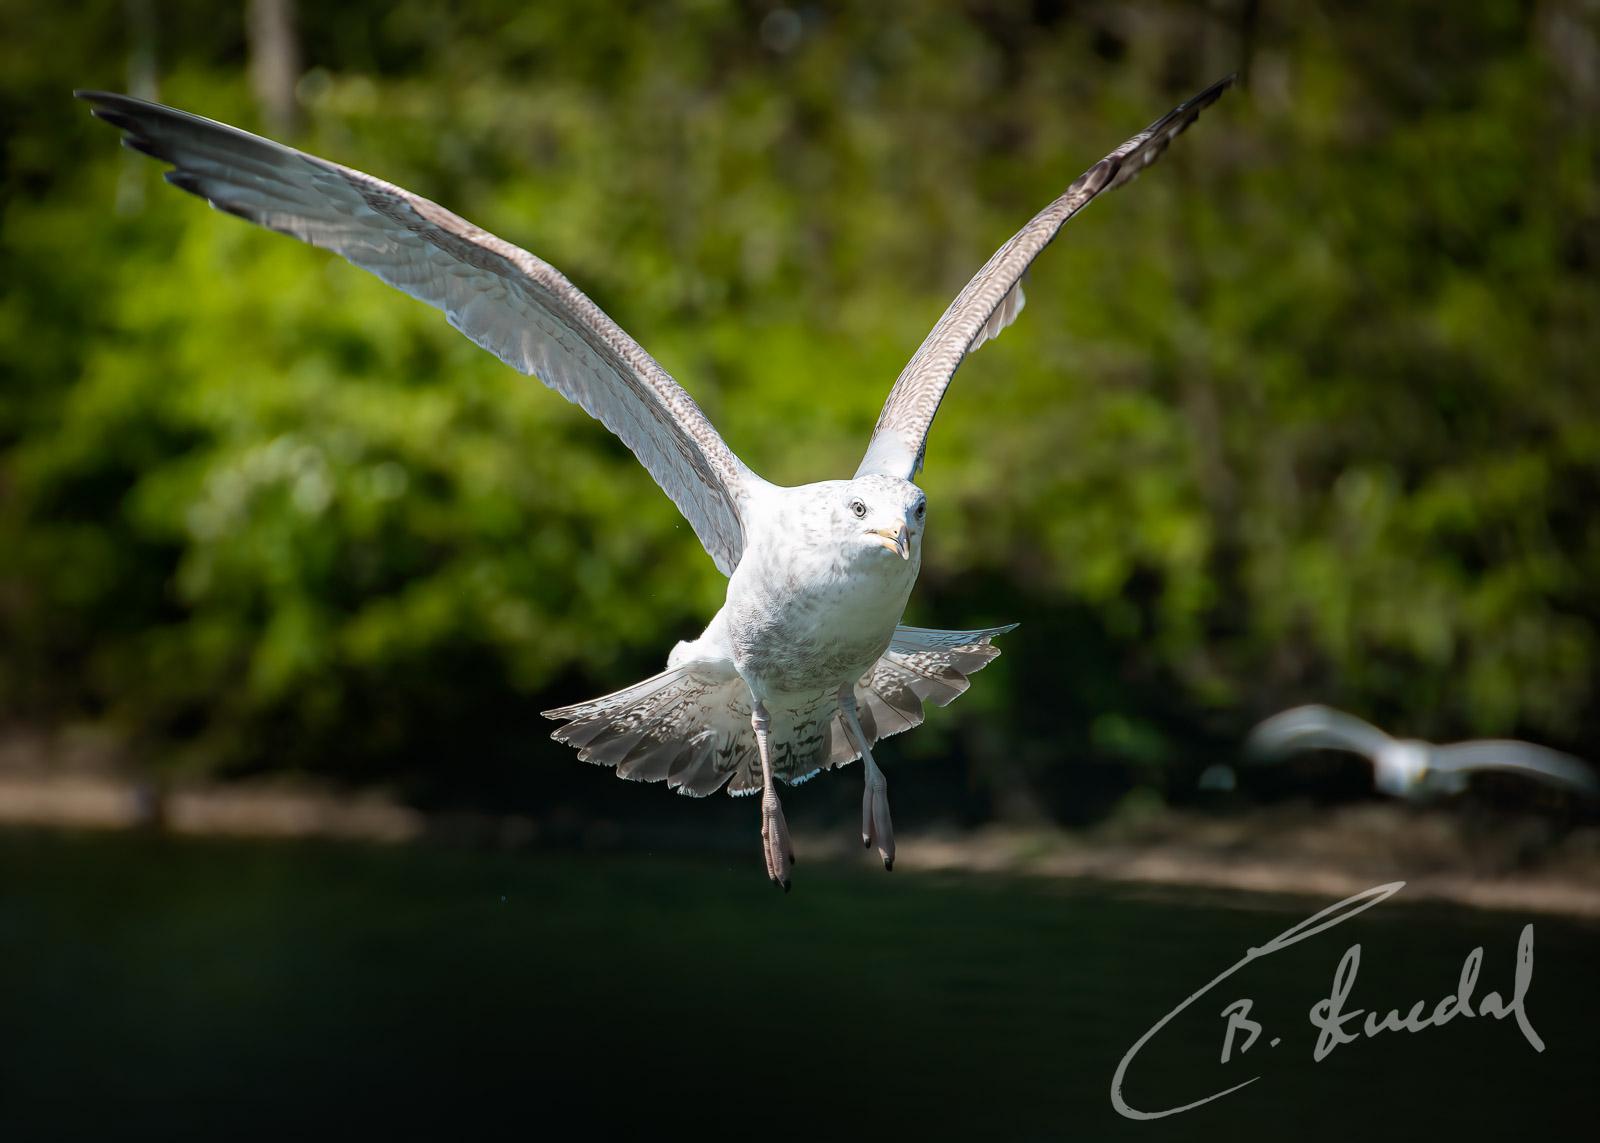 Seagull approach